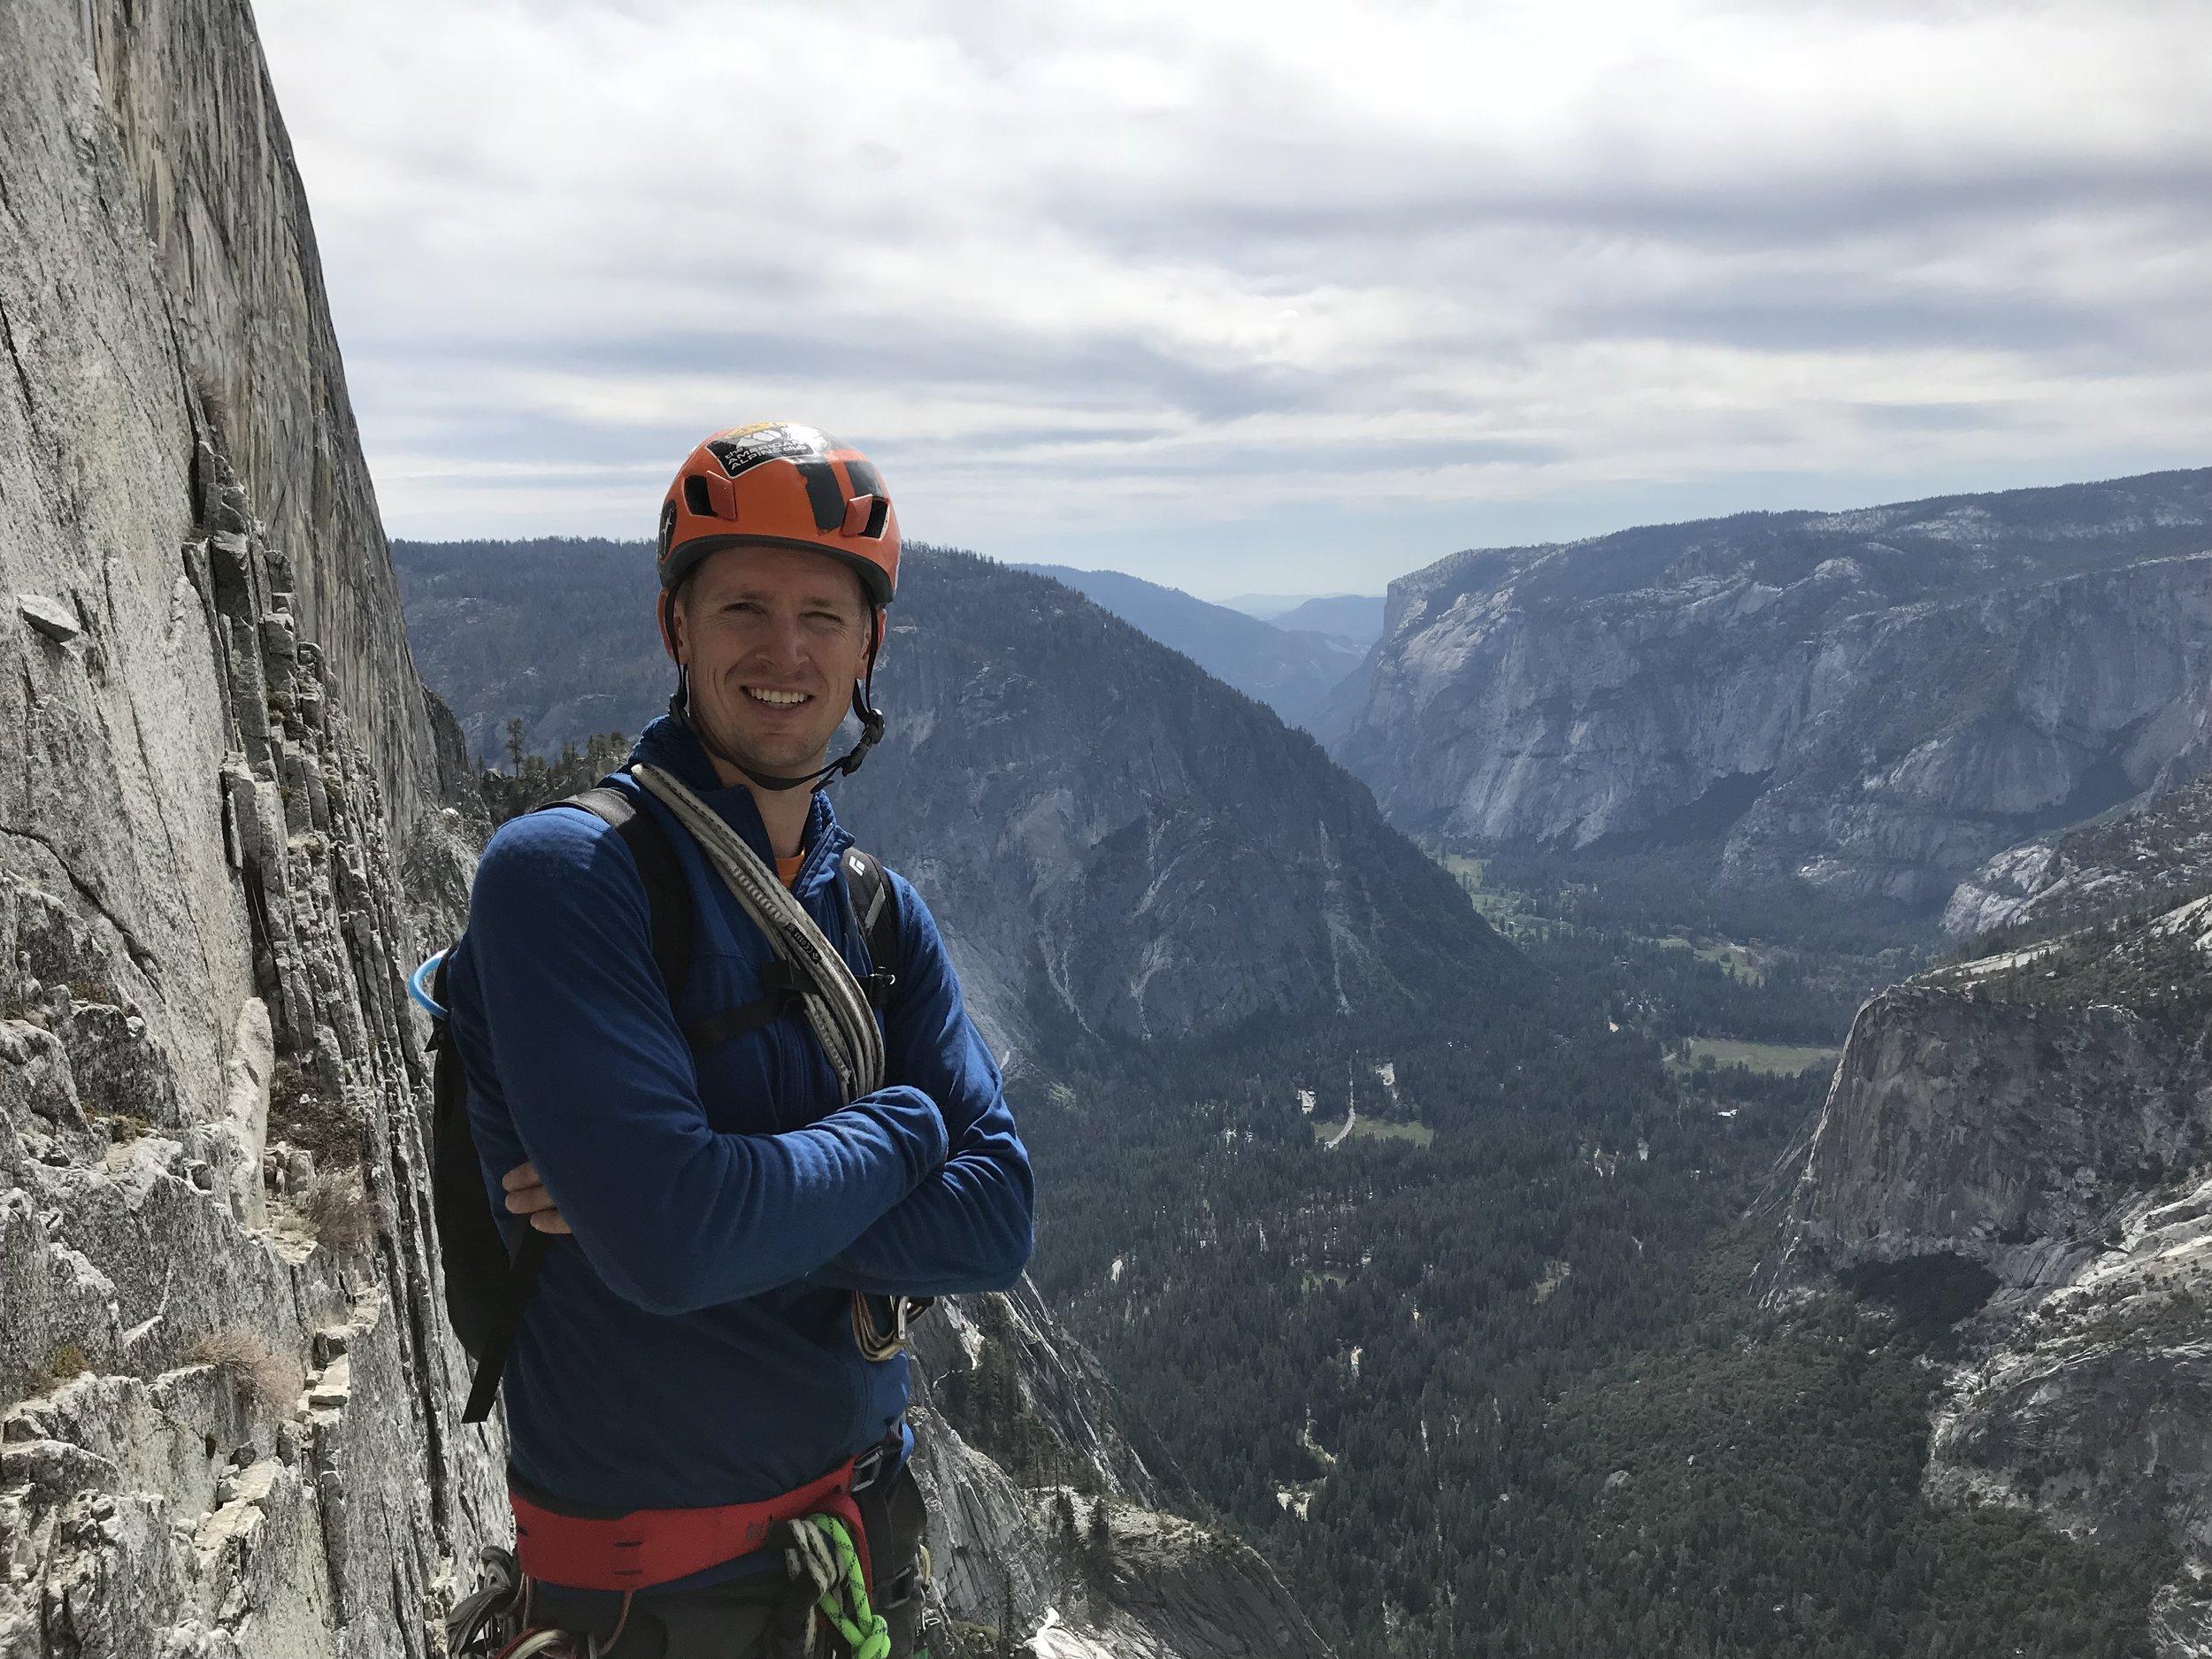 Jonathan Wachtel Half Dome Rock Climbing Yosemite, CA